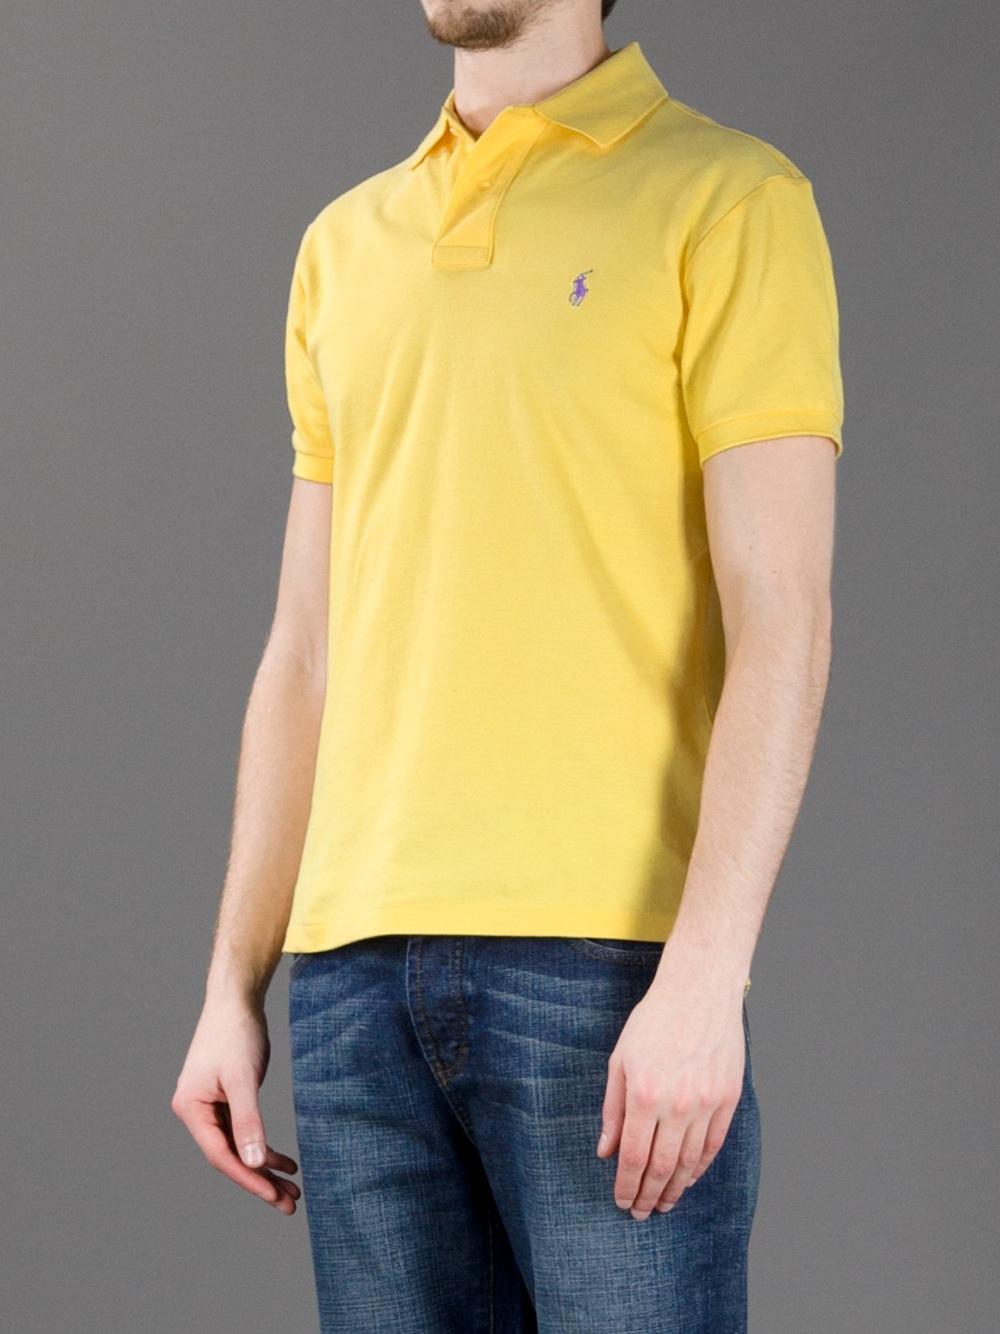 Lyst polo ralph lauren logo polo shirt in yellow for men for Ralph lauren logo shirt